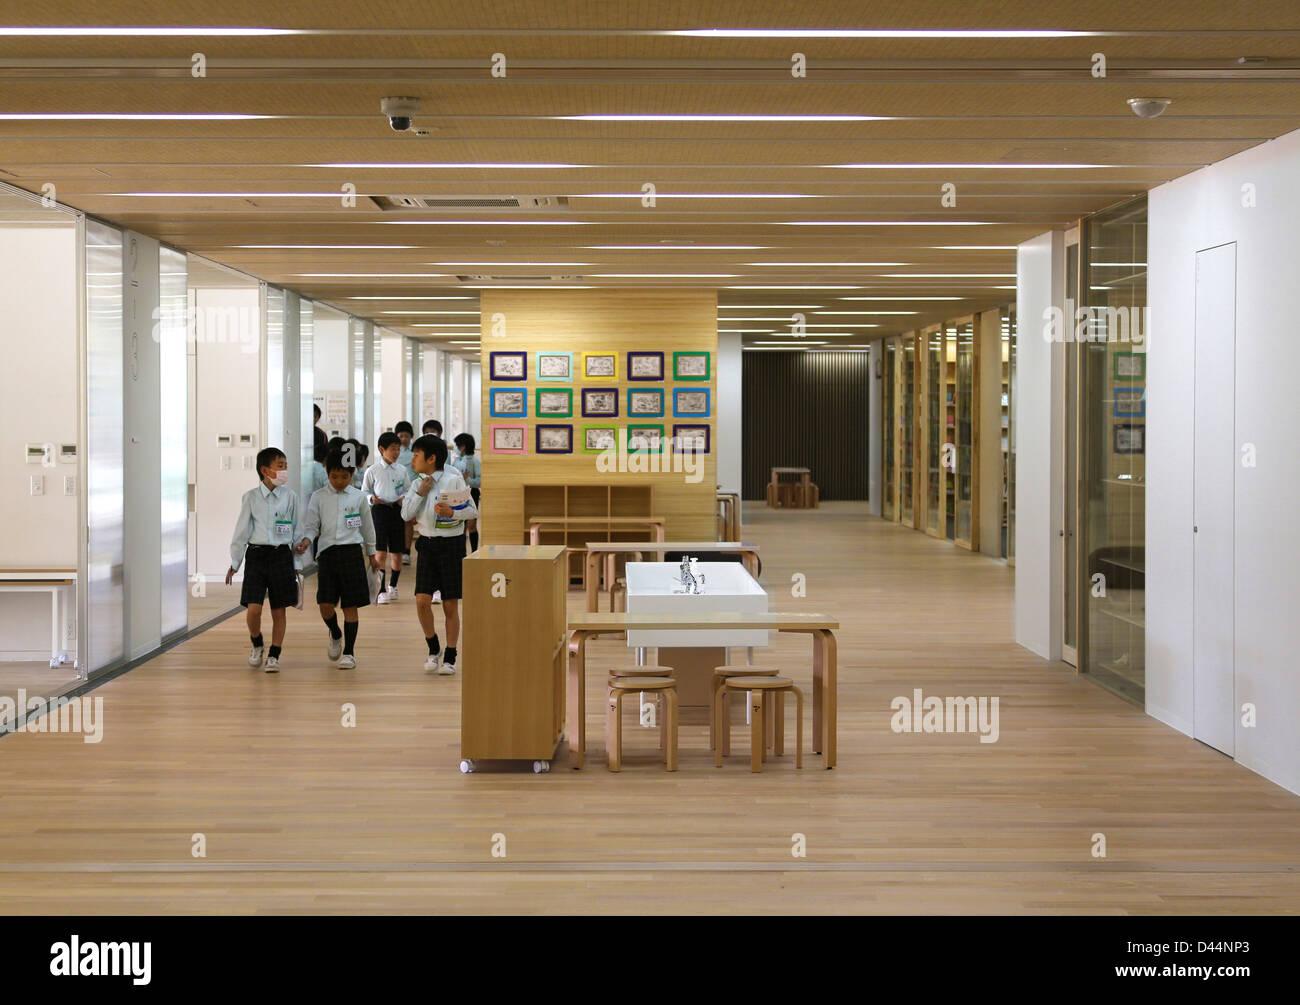 Teikyo University Elementary School, Tokyo, Japan. Architect: Kengo Kuma,  2012. Interior View Corridor On Ground Floor.